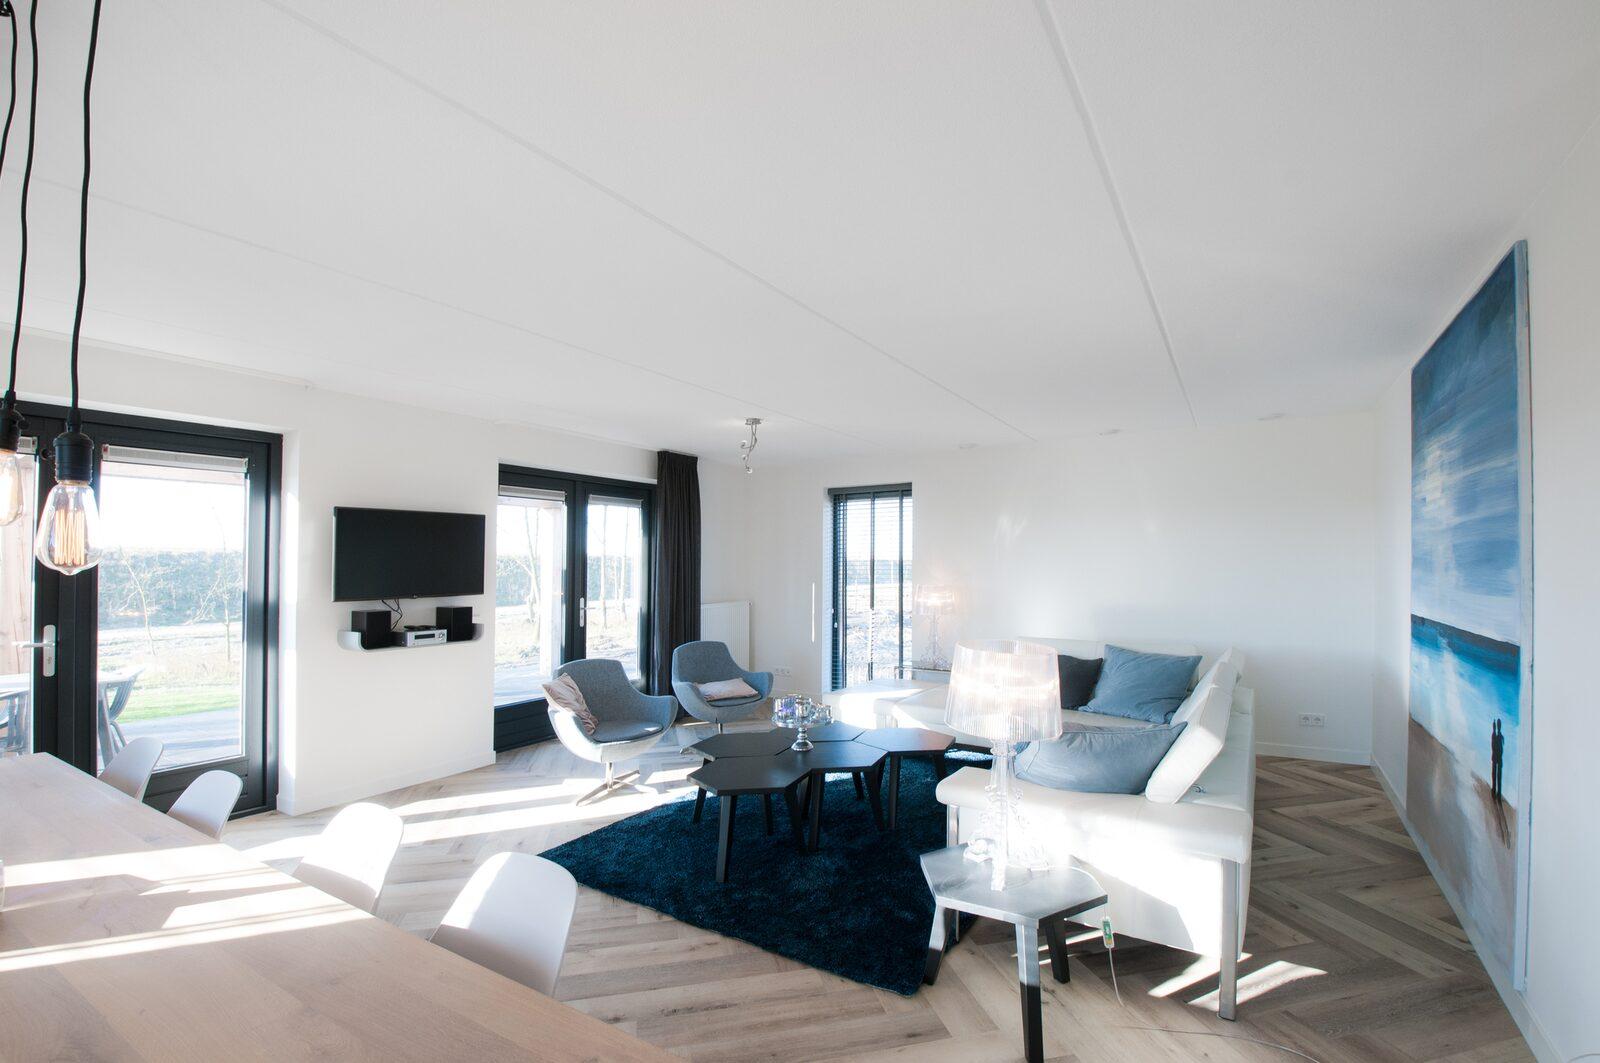 8-person Comfort | Oesterdam